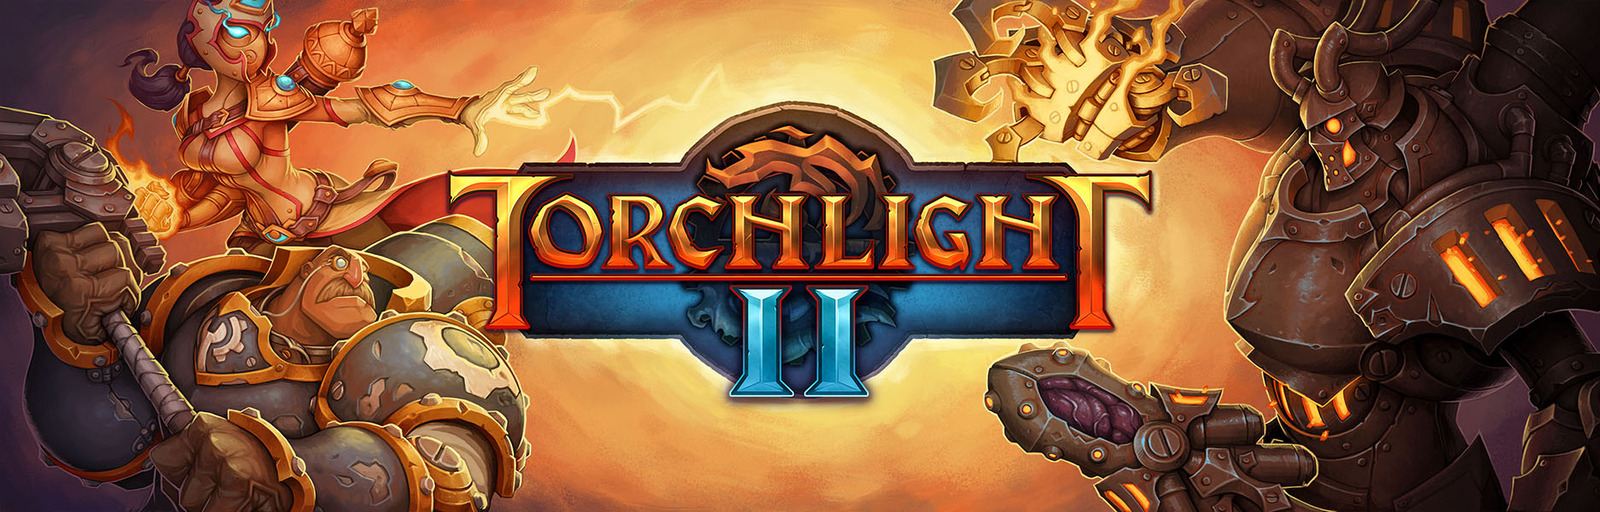 torchlight ii christmas giveaway gamersbook. Black Bedroom Furniture Sets. Home Design Ideas